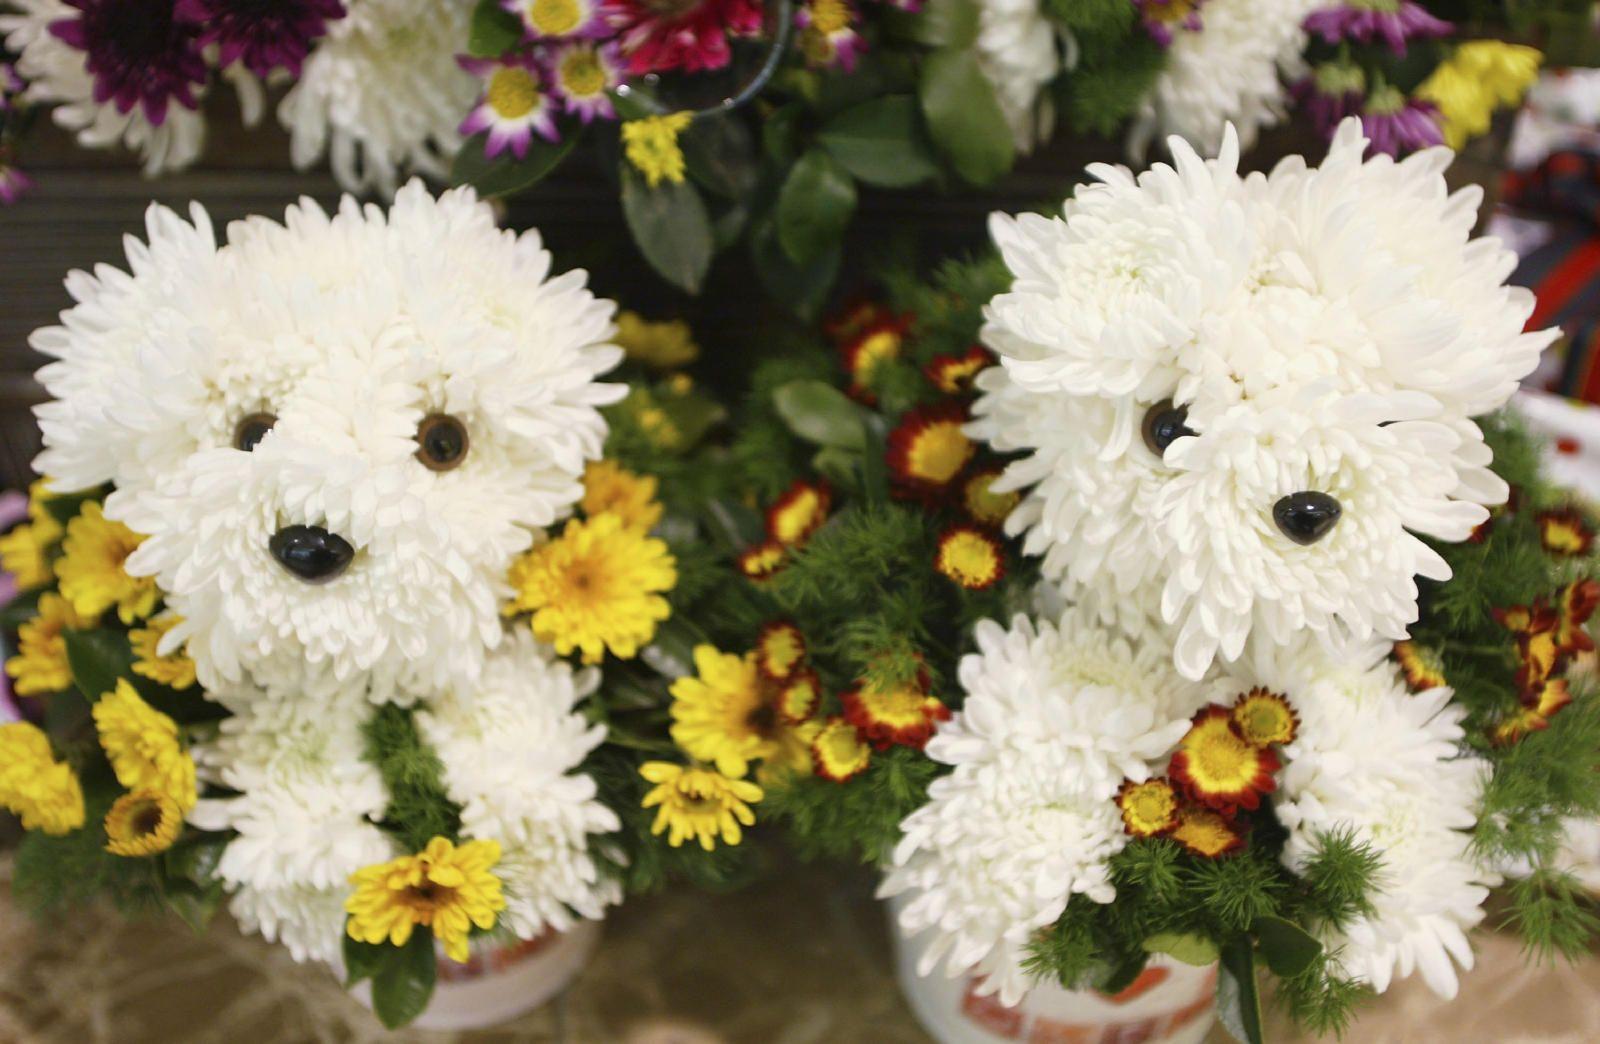 Toxic And Non Toxic Plants Plants Toxic To Dogs Plants Poisonous To Dogs Toxic Plants For Cats